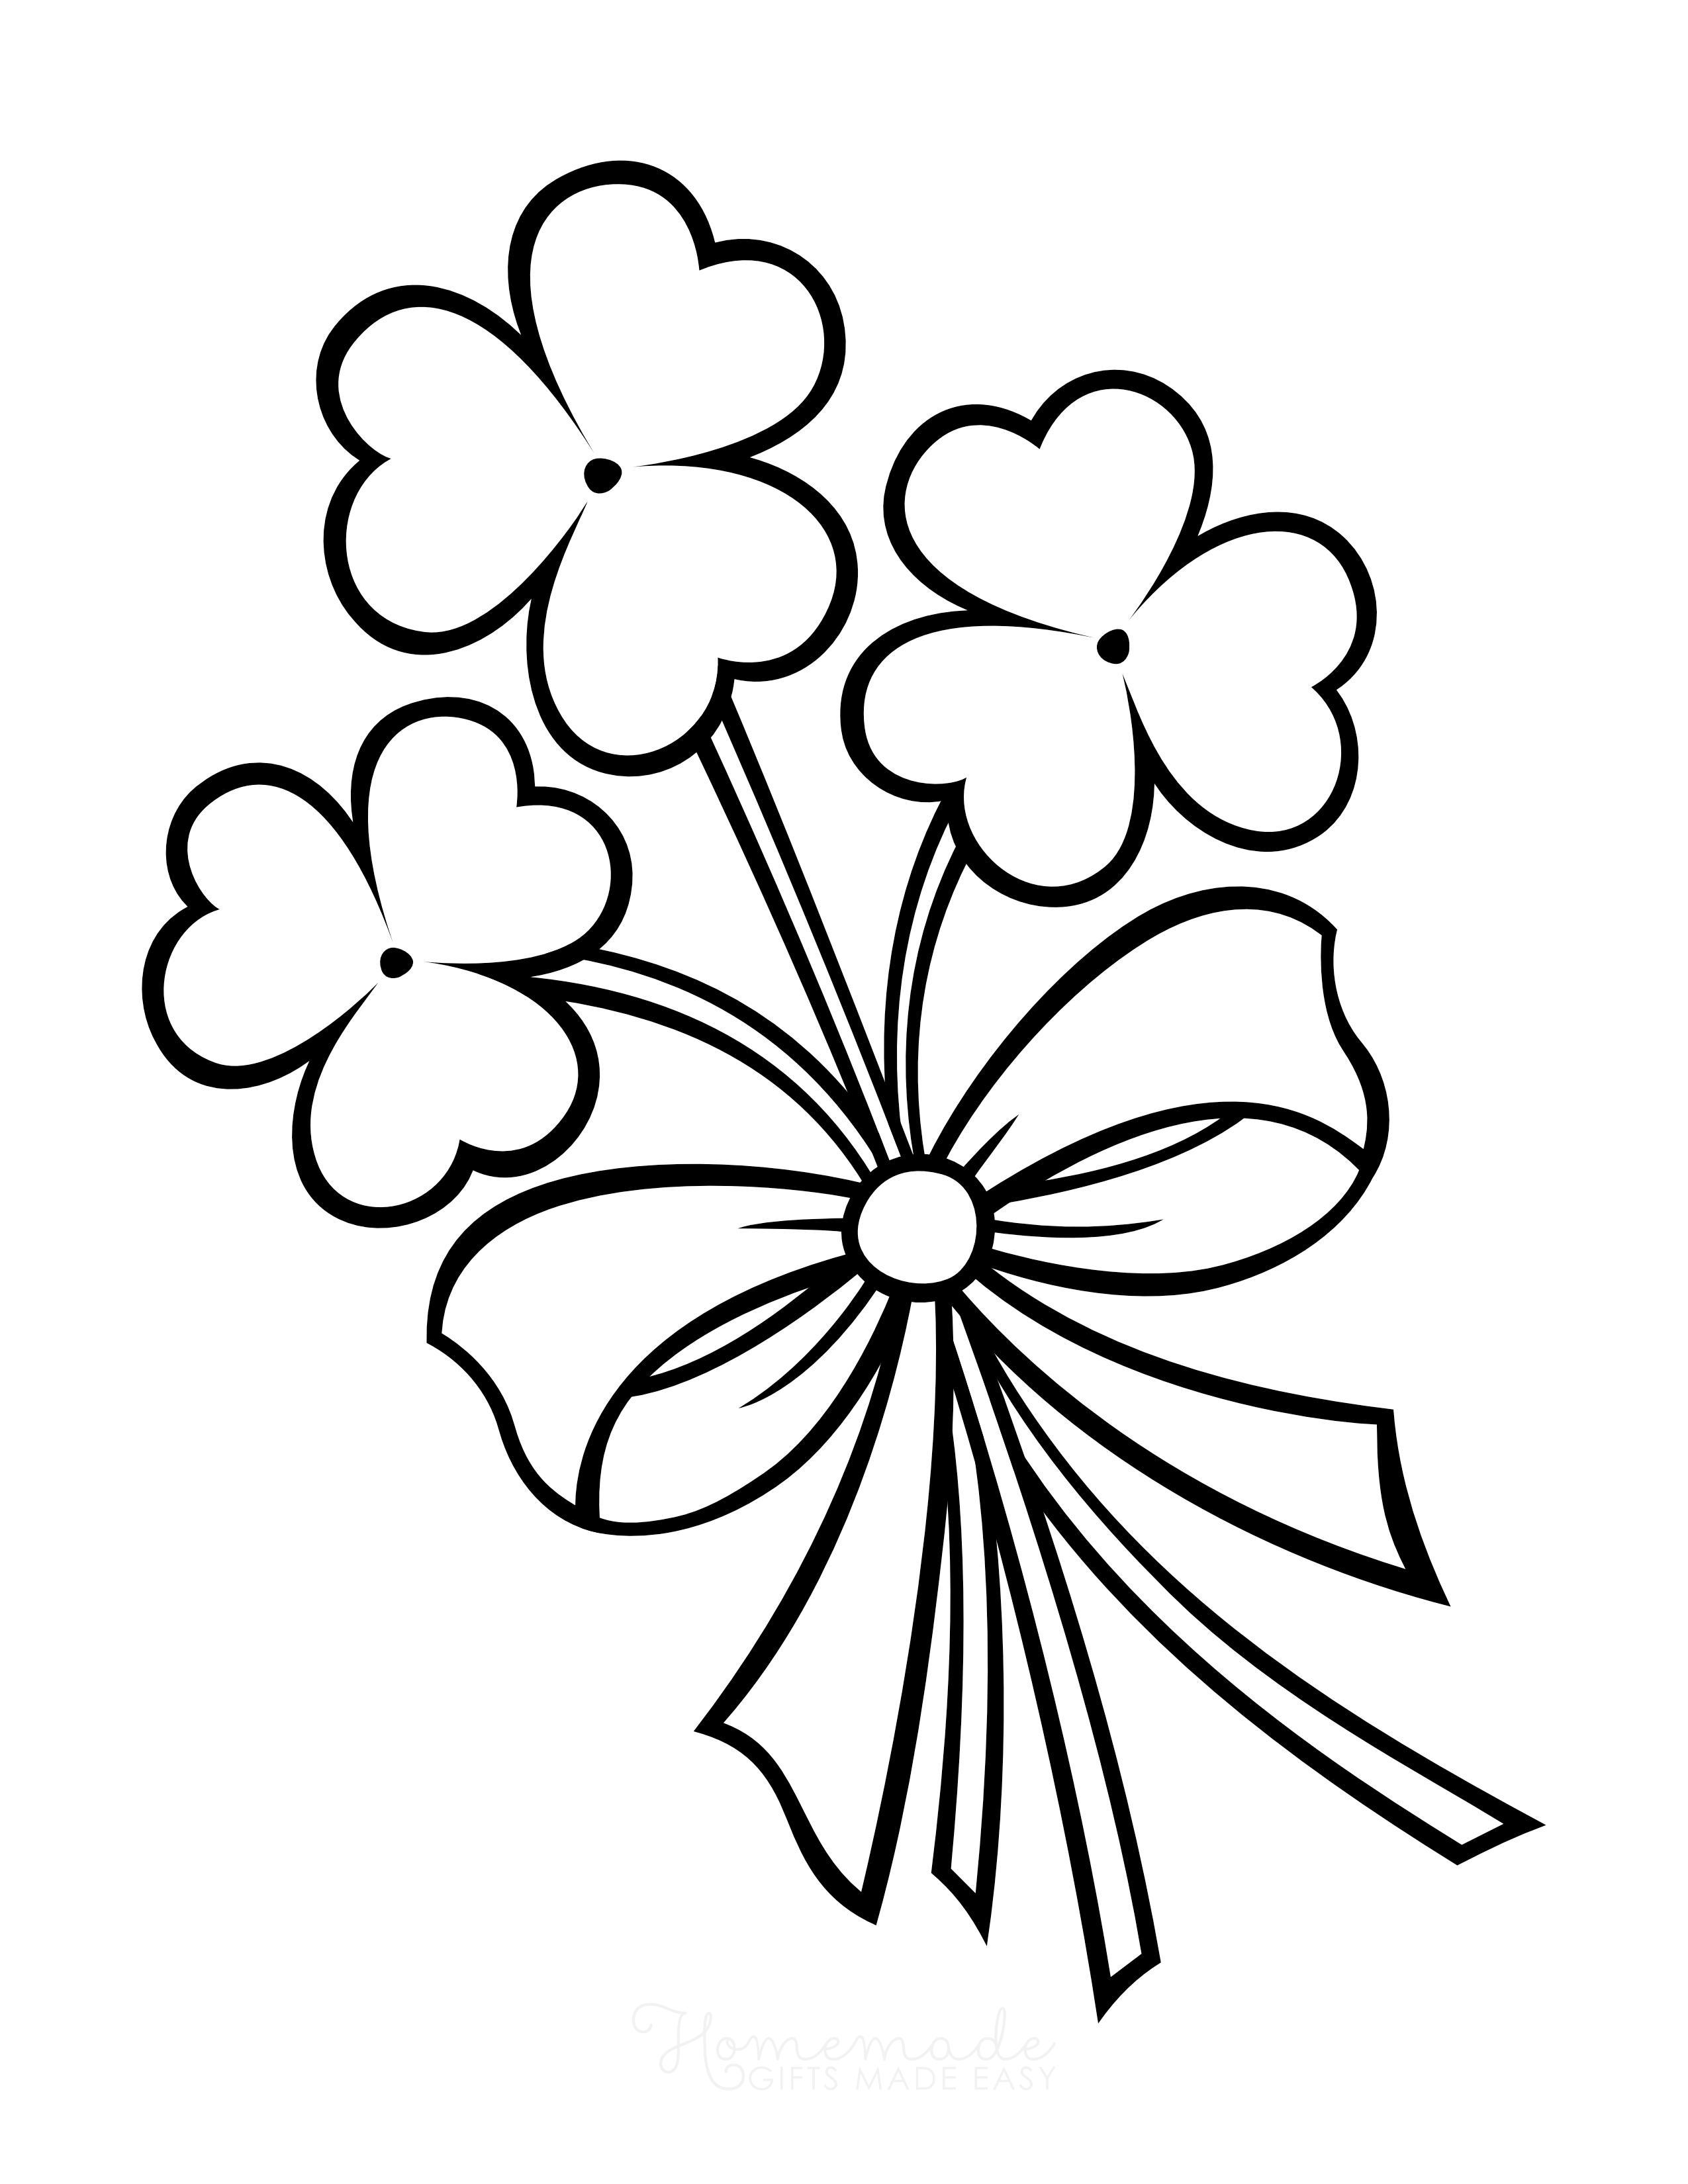 Shamrock bauquet Coloring Page